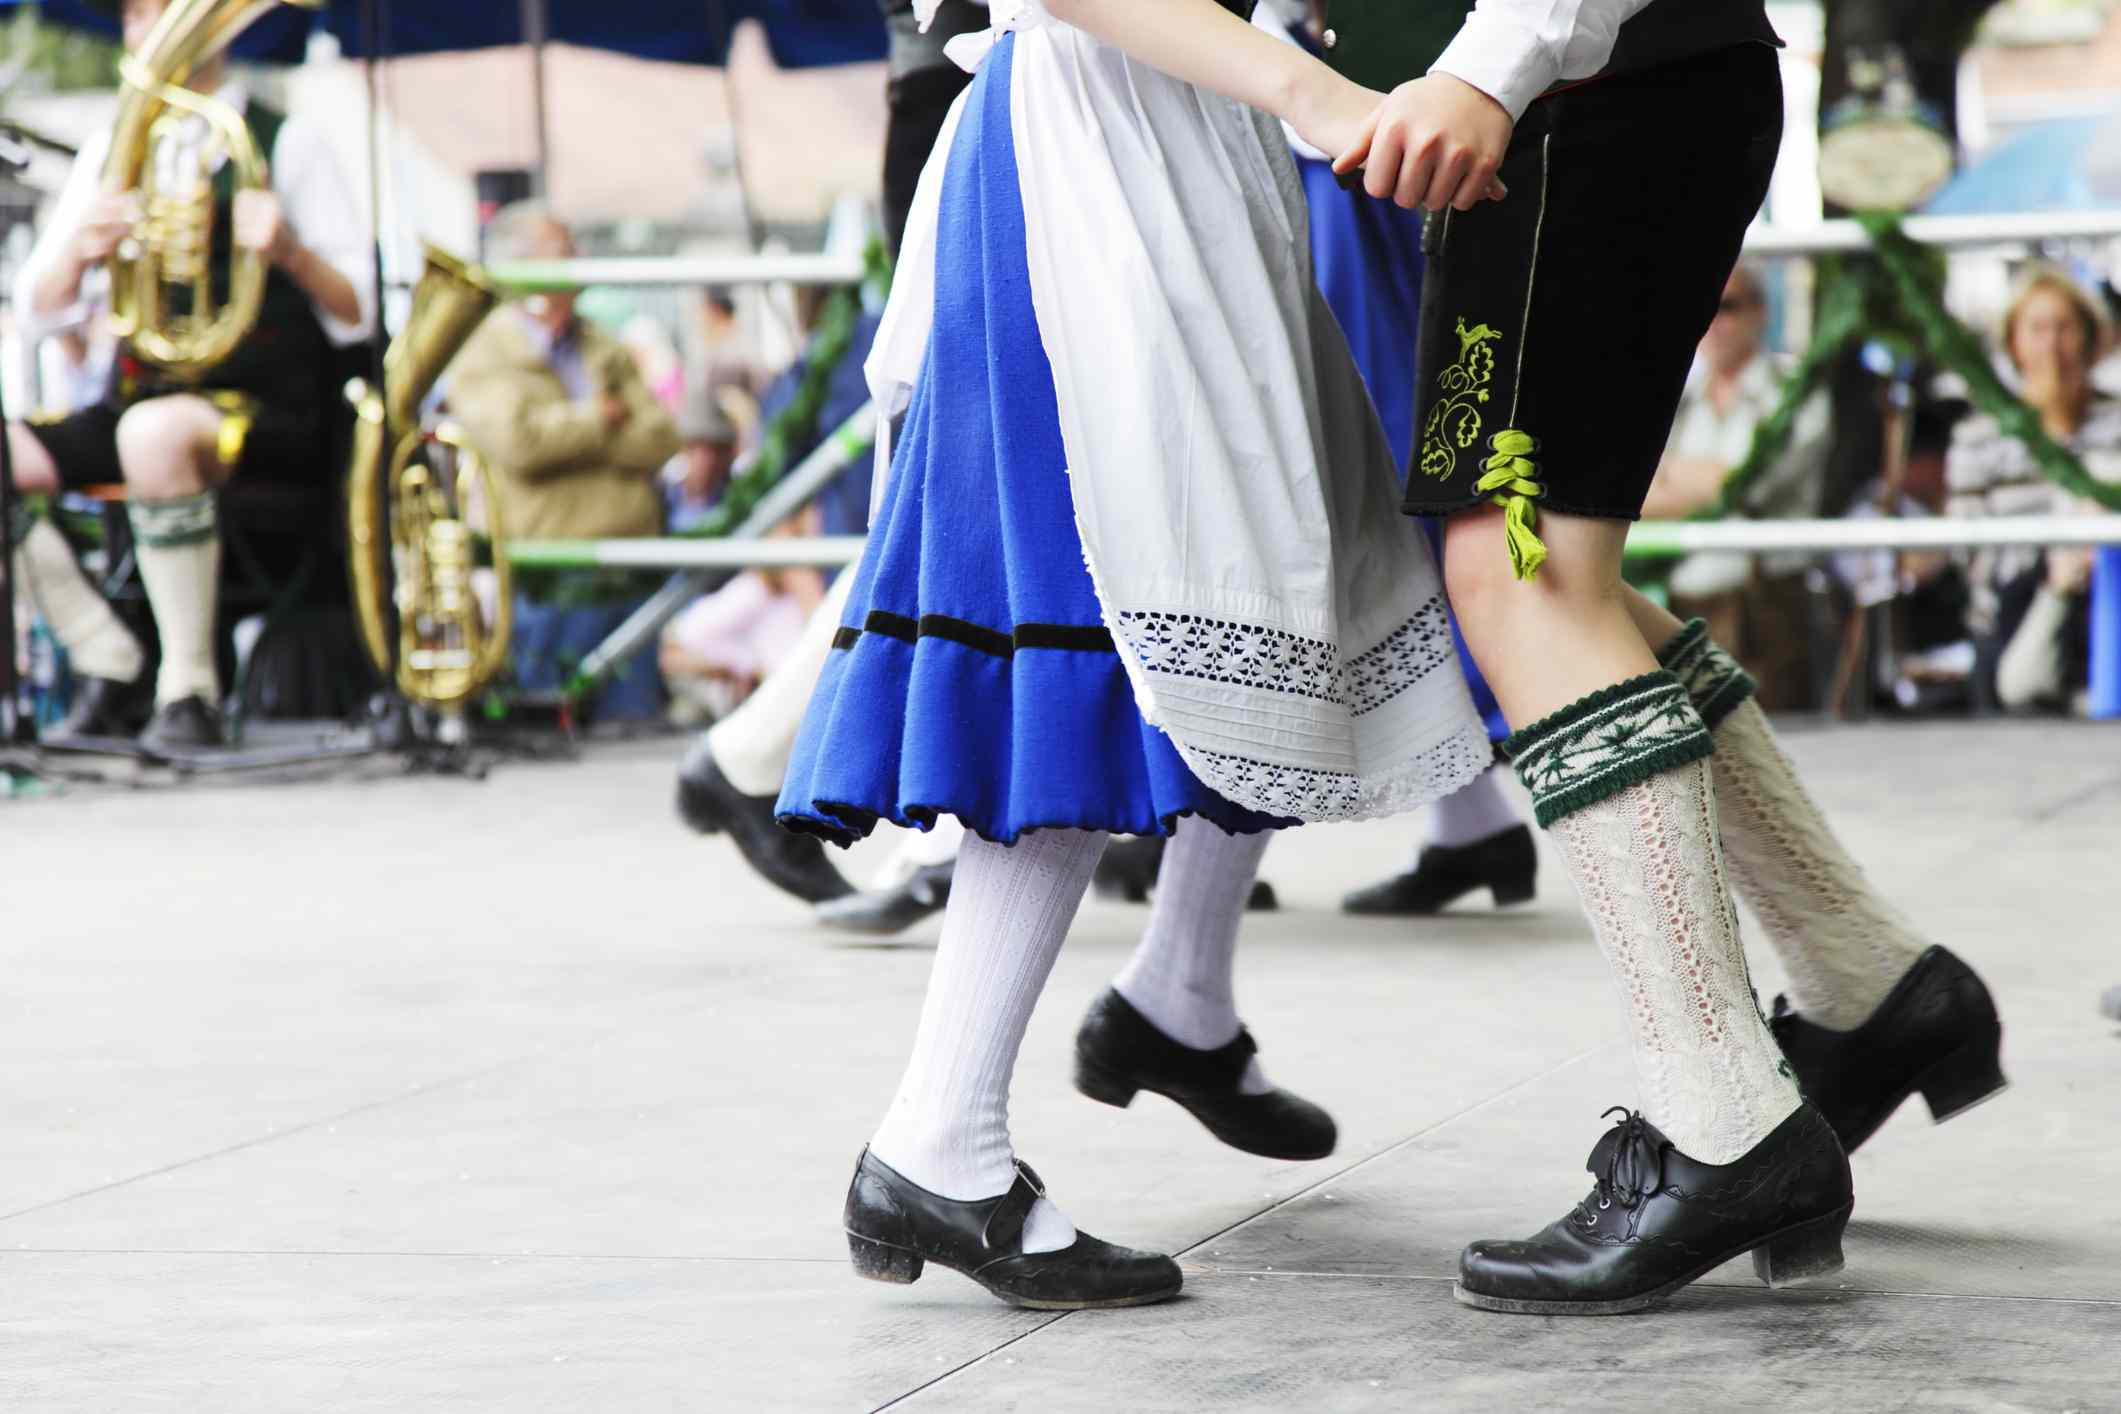 Bavarian couple perform a historical dance